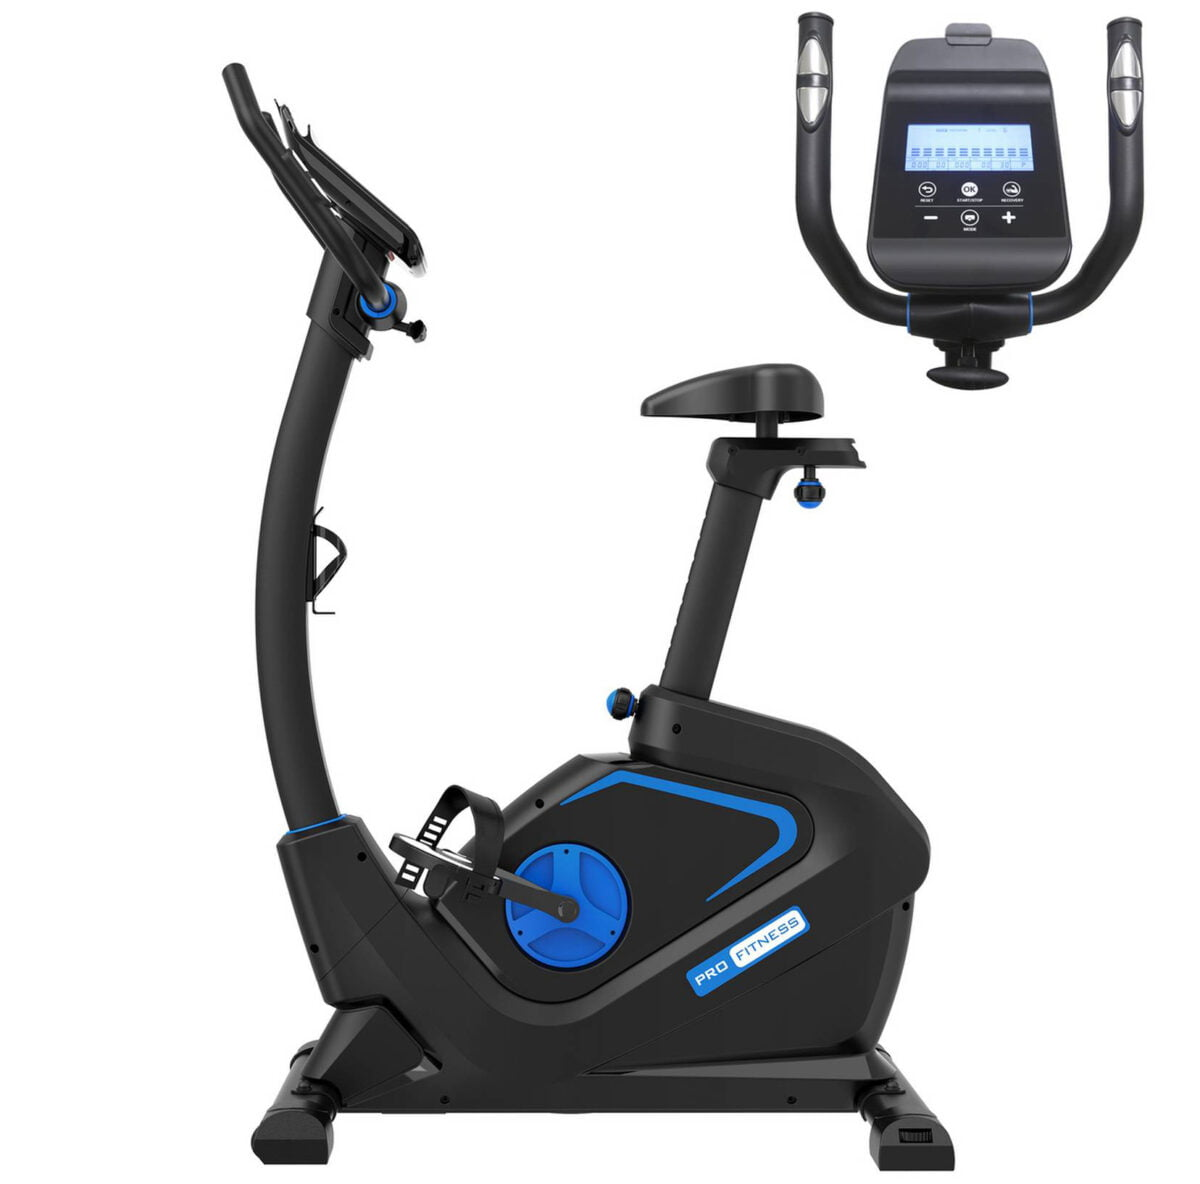 Pro Fitness EB3000 Exercise Bike Voucher Code